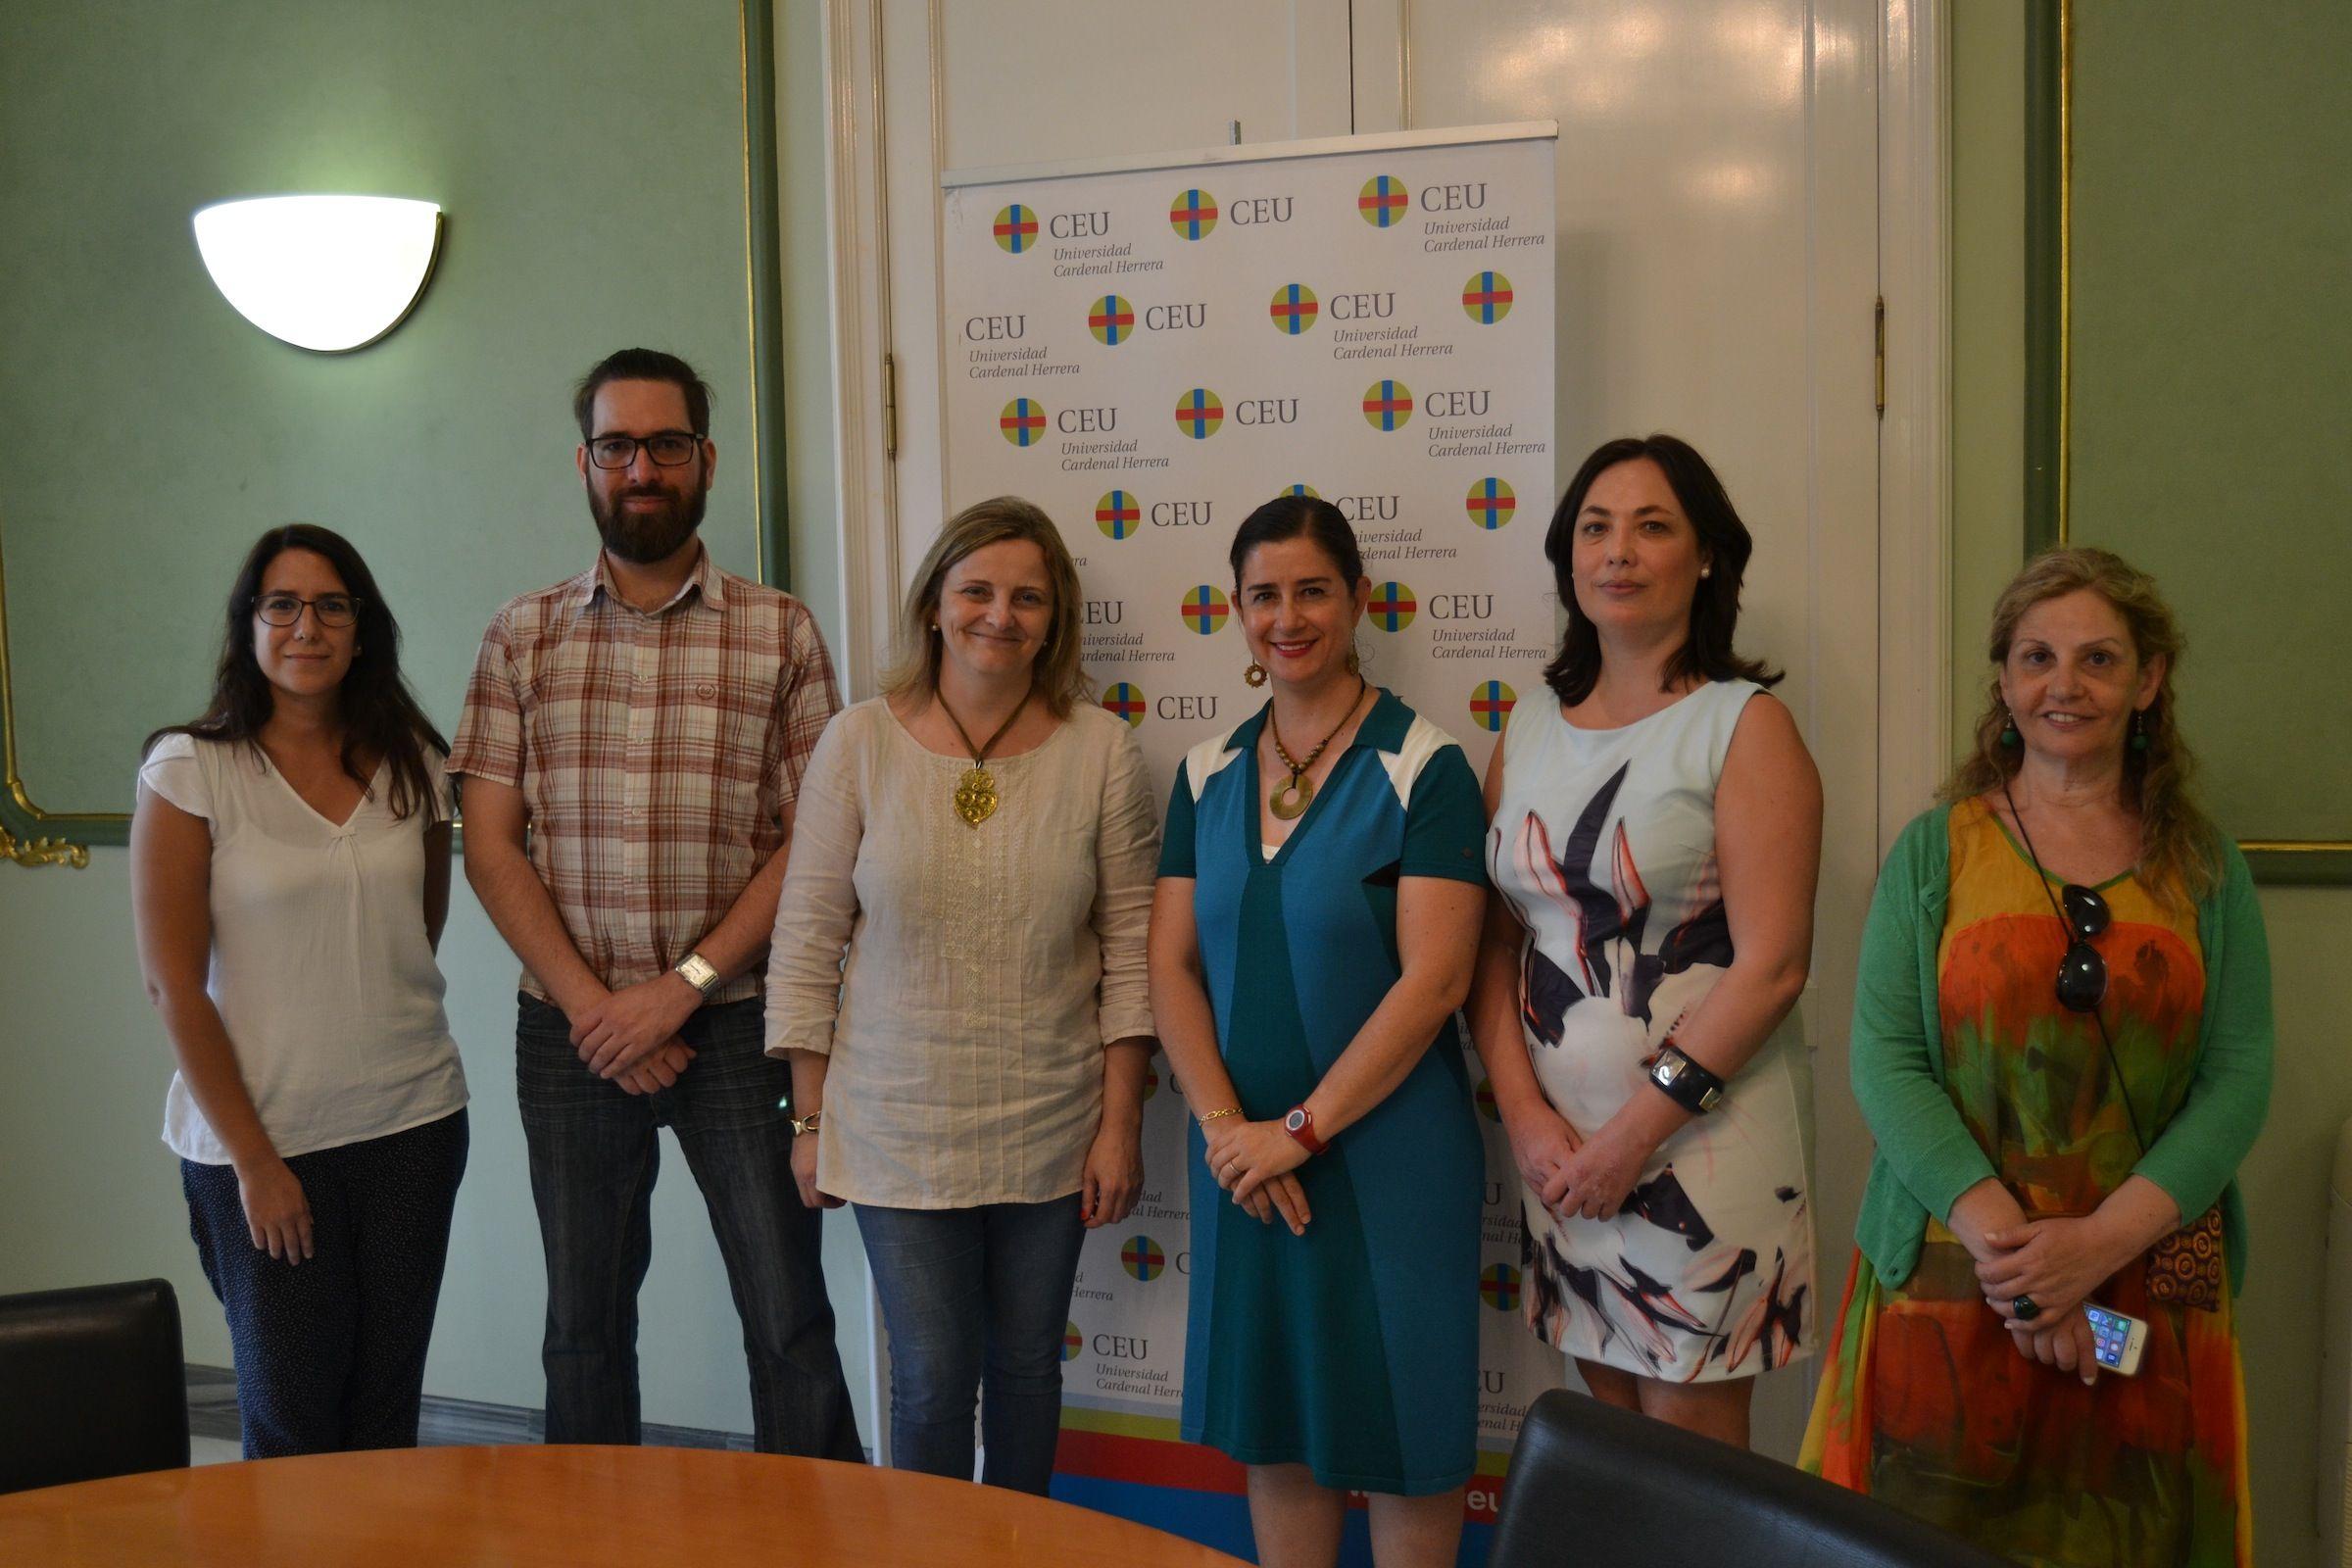 Elvira García de Torres, tercera por la izq., junto a los miembros del comité organizador del encuentro del Grupo de Ética de la IAMCR en la CEU-UCH.